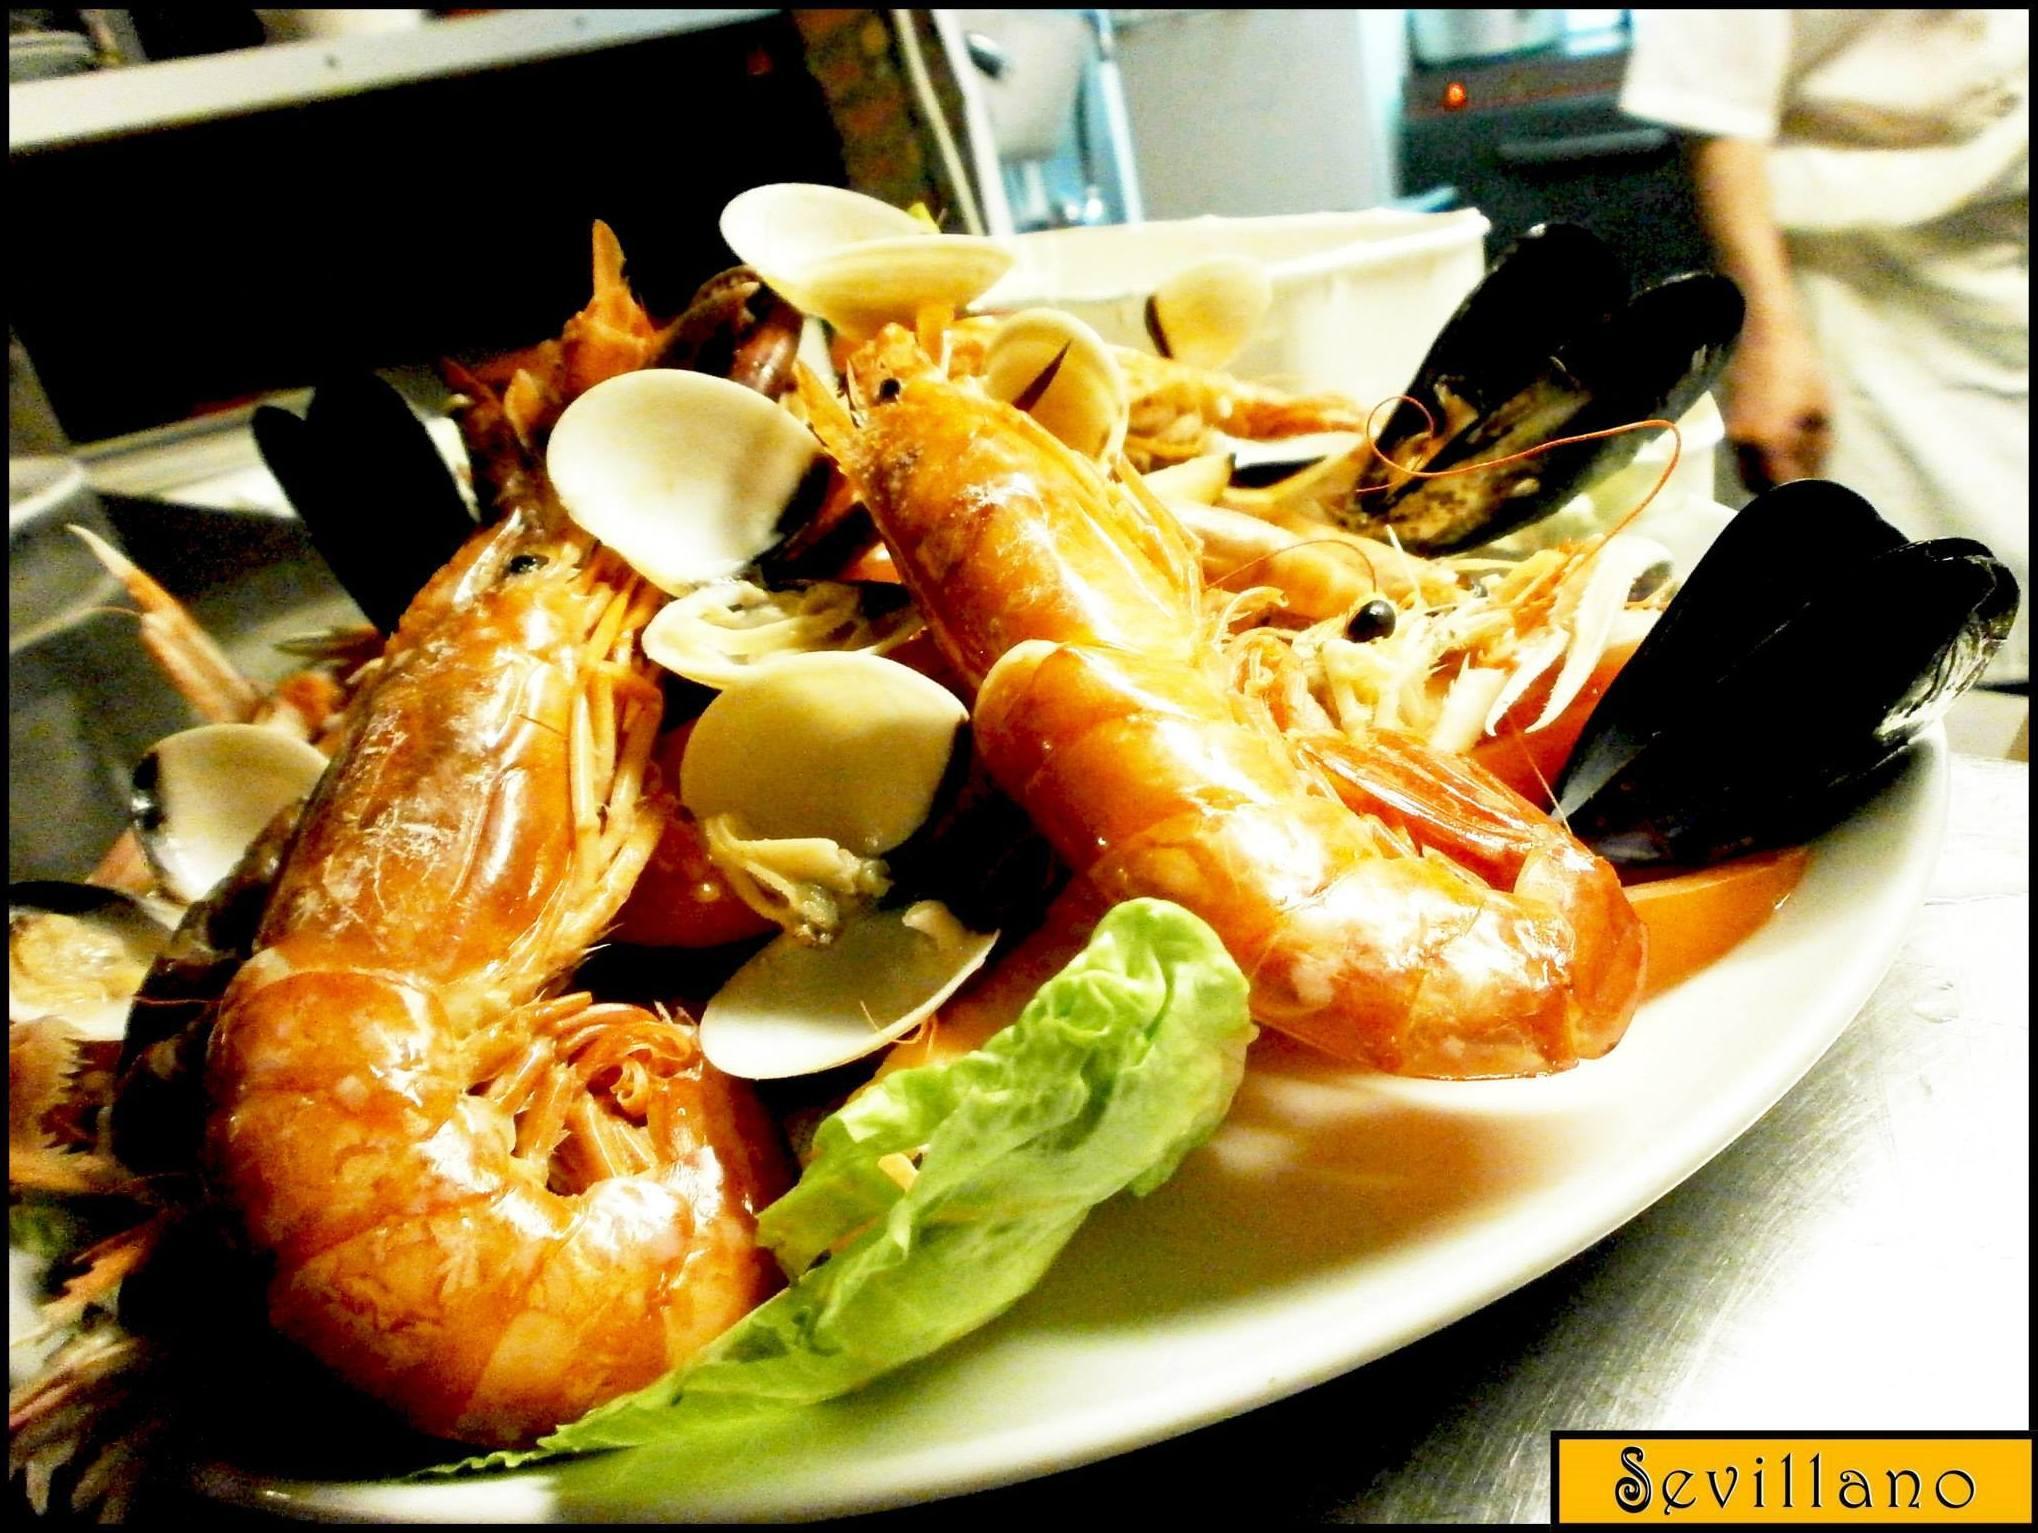 Foto 58 de Andalusian cuisine en Nerja | Restaurante Sevillano